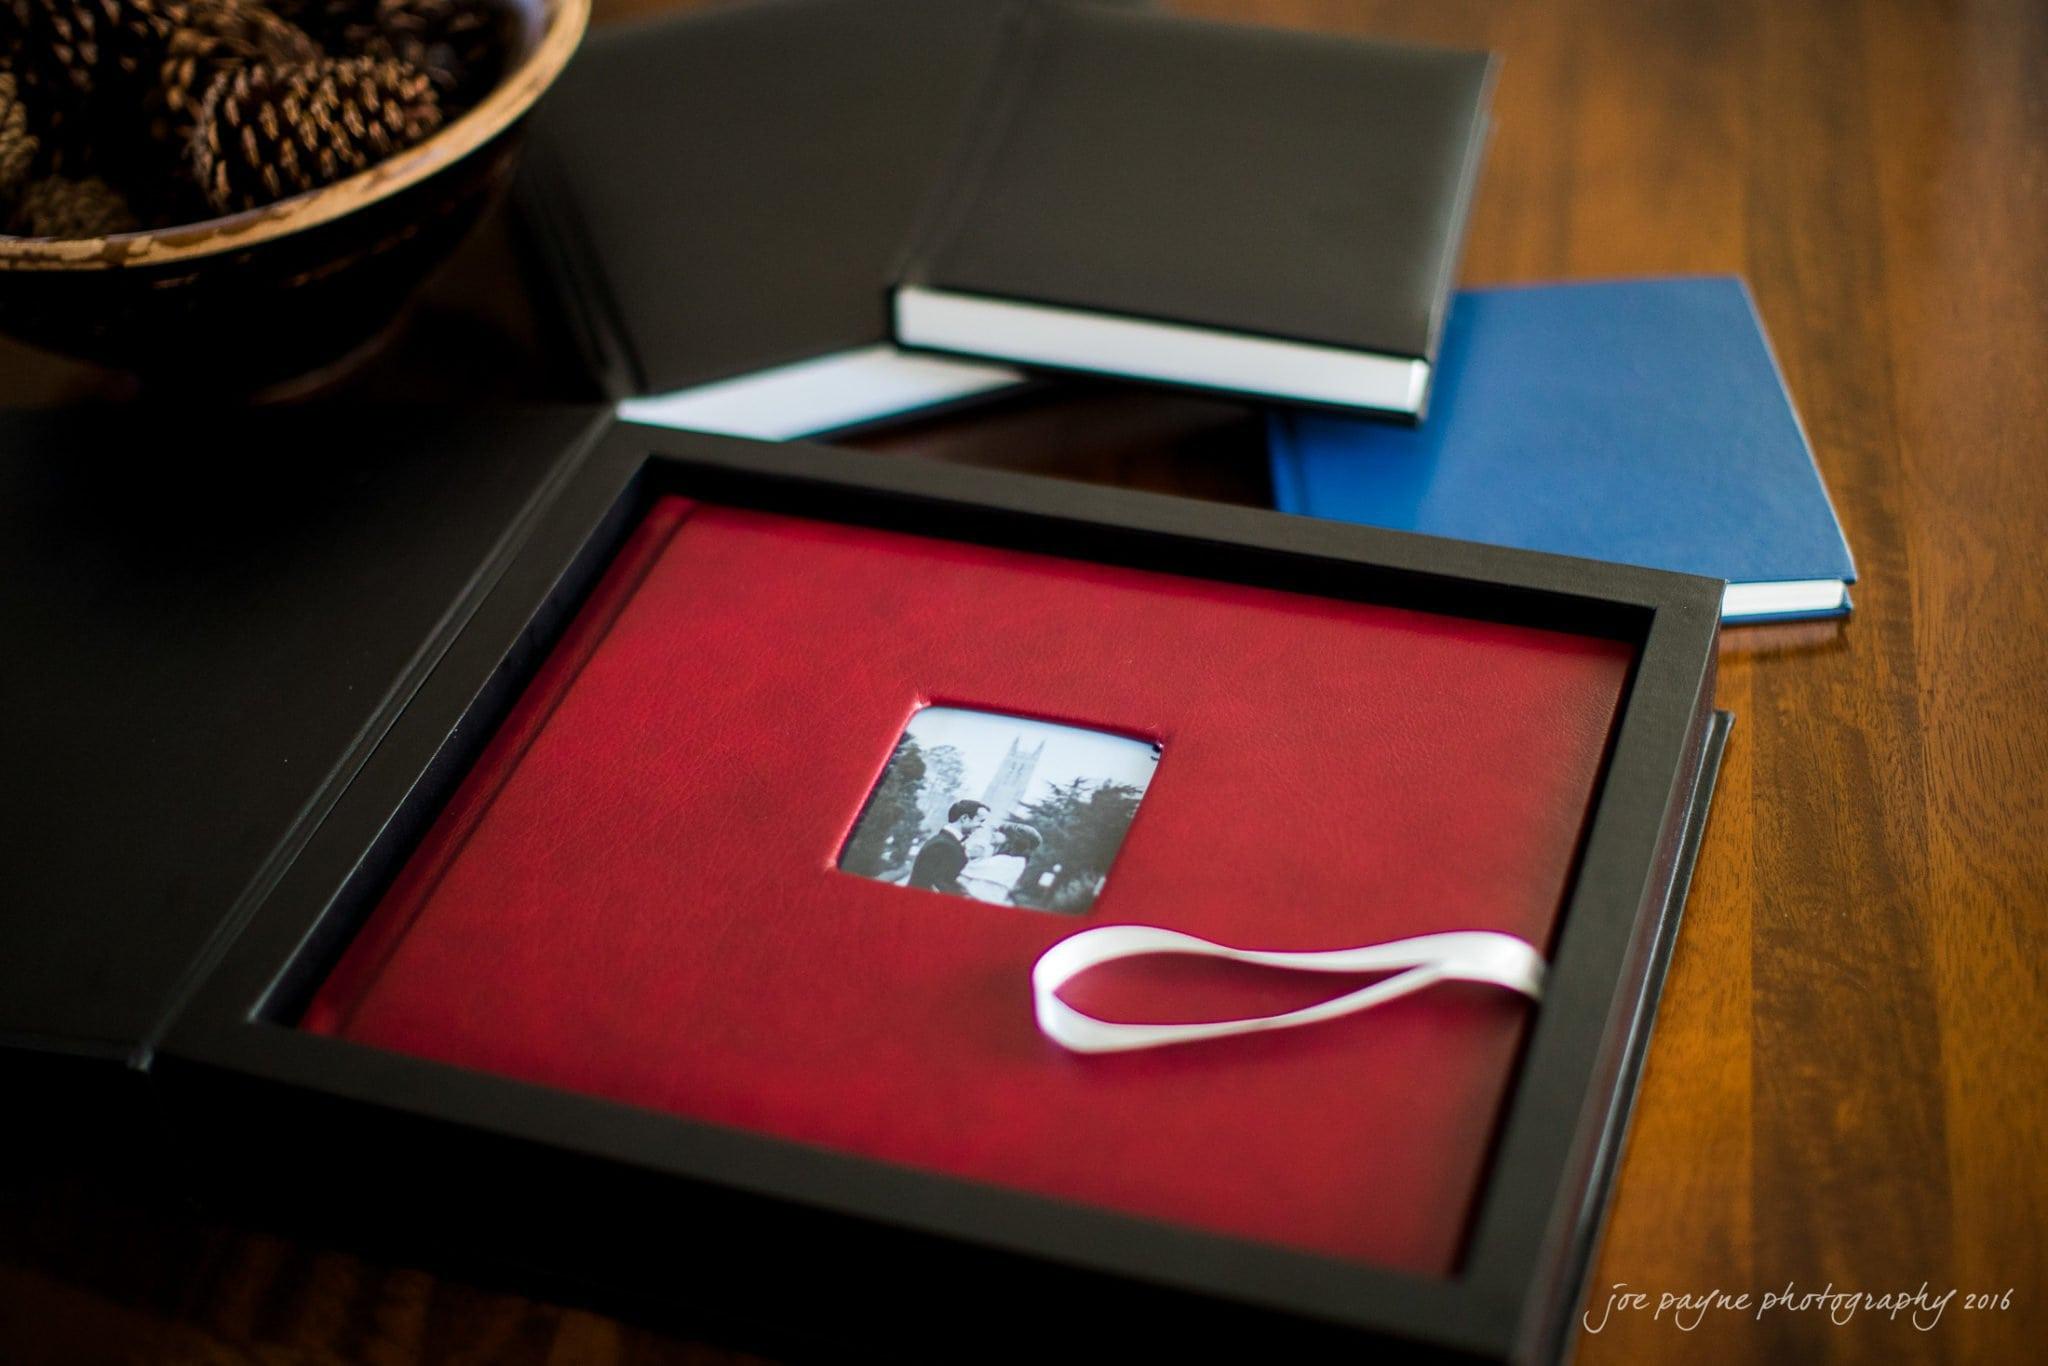 raleigh-wedding-photographer-joe-payne-photography-albums-1